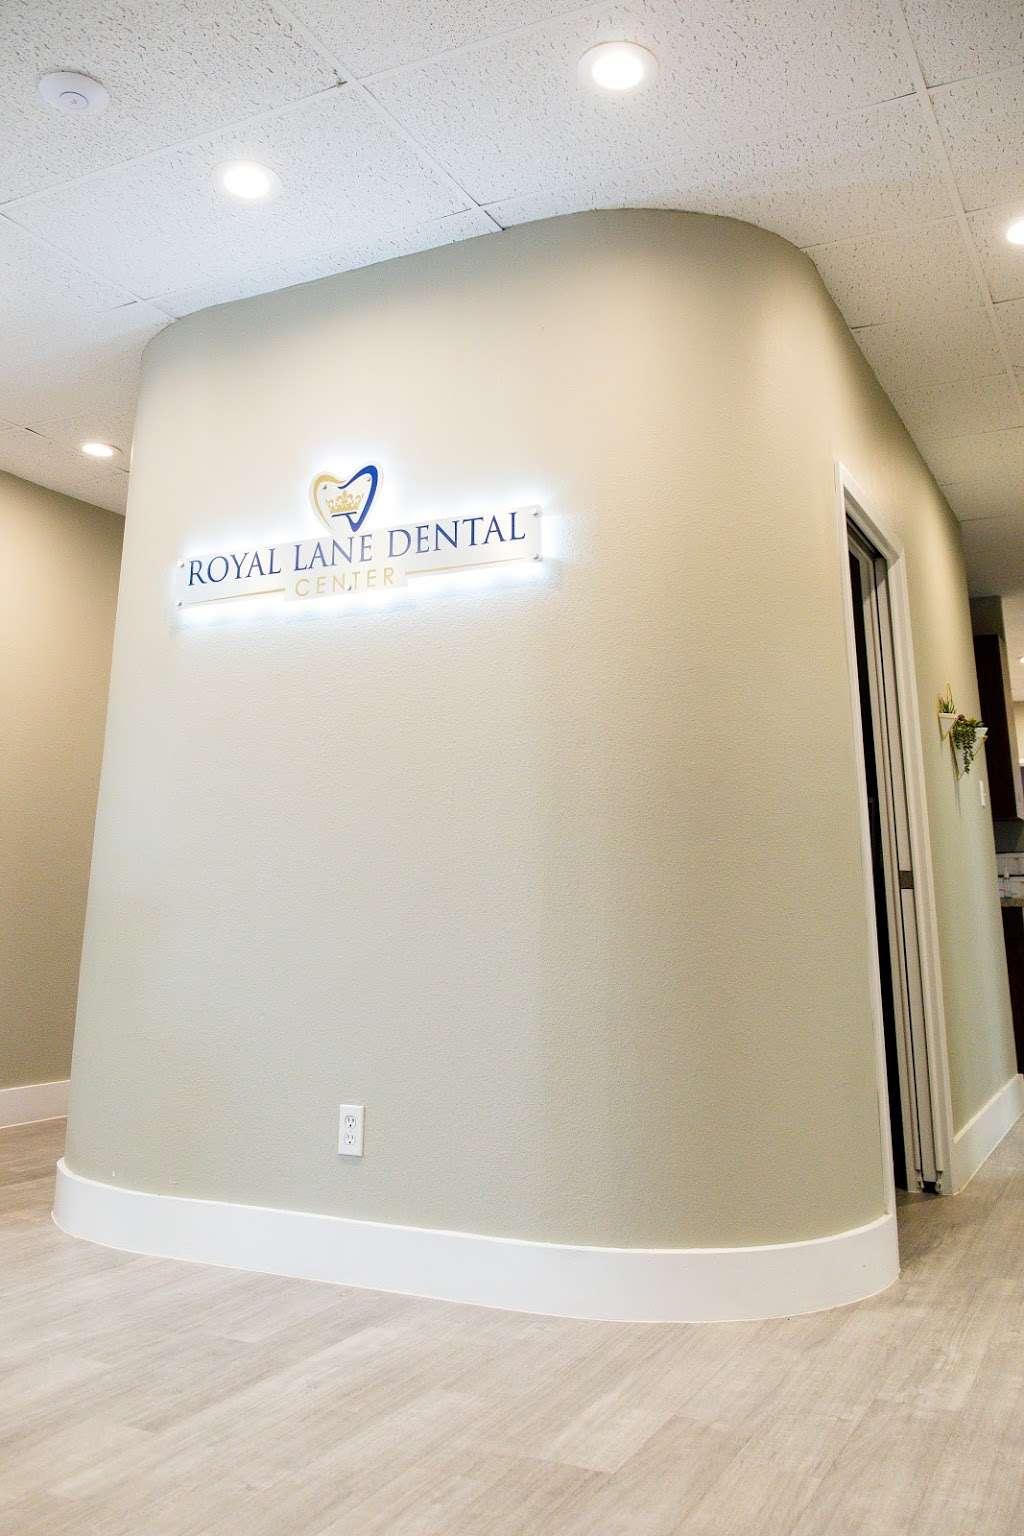 Royal Lane Dental Center - dentist  | Photo 8 of 8 | Address: 8499 Greenville Ave #210, Dallas, TX 75231, USA | Phone: (469) 904-2080